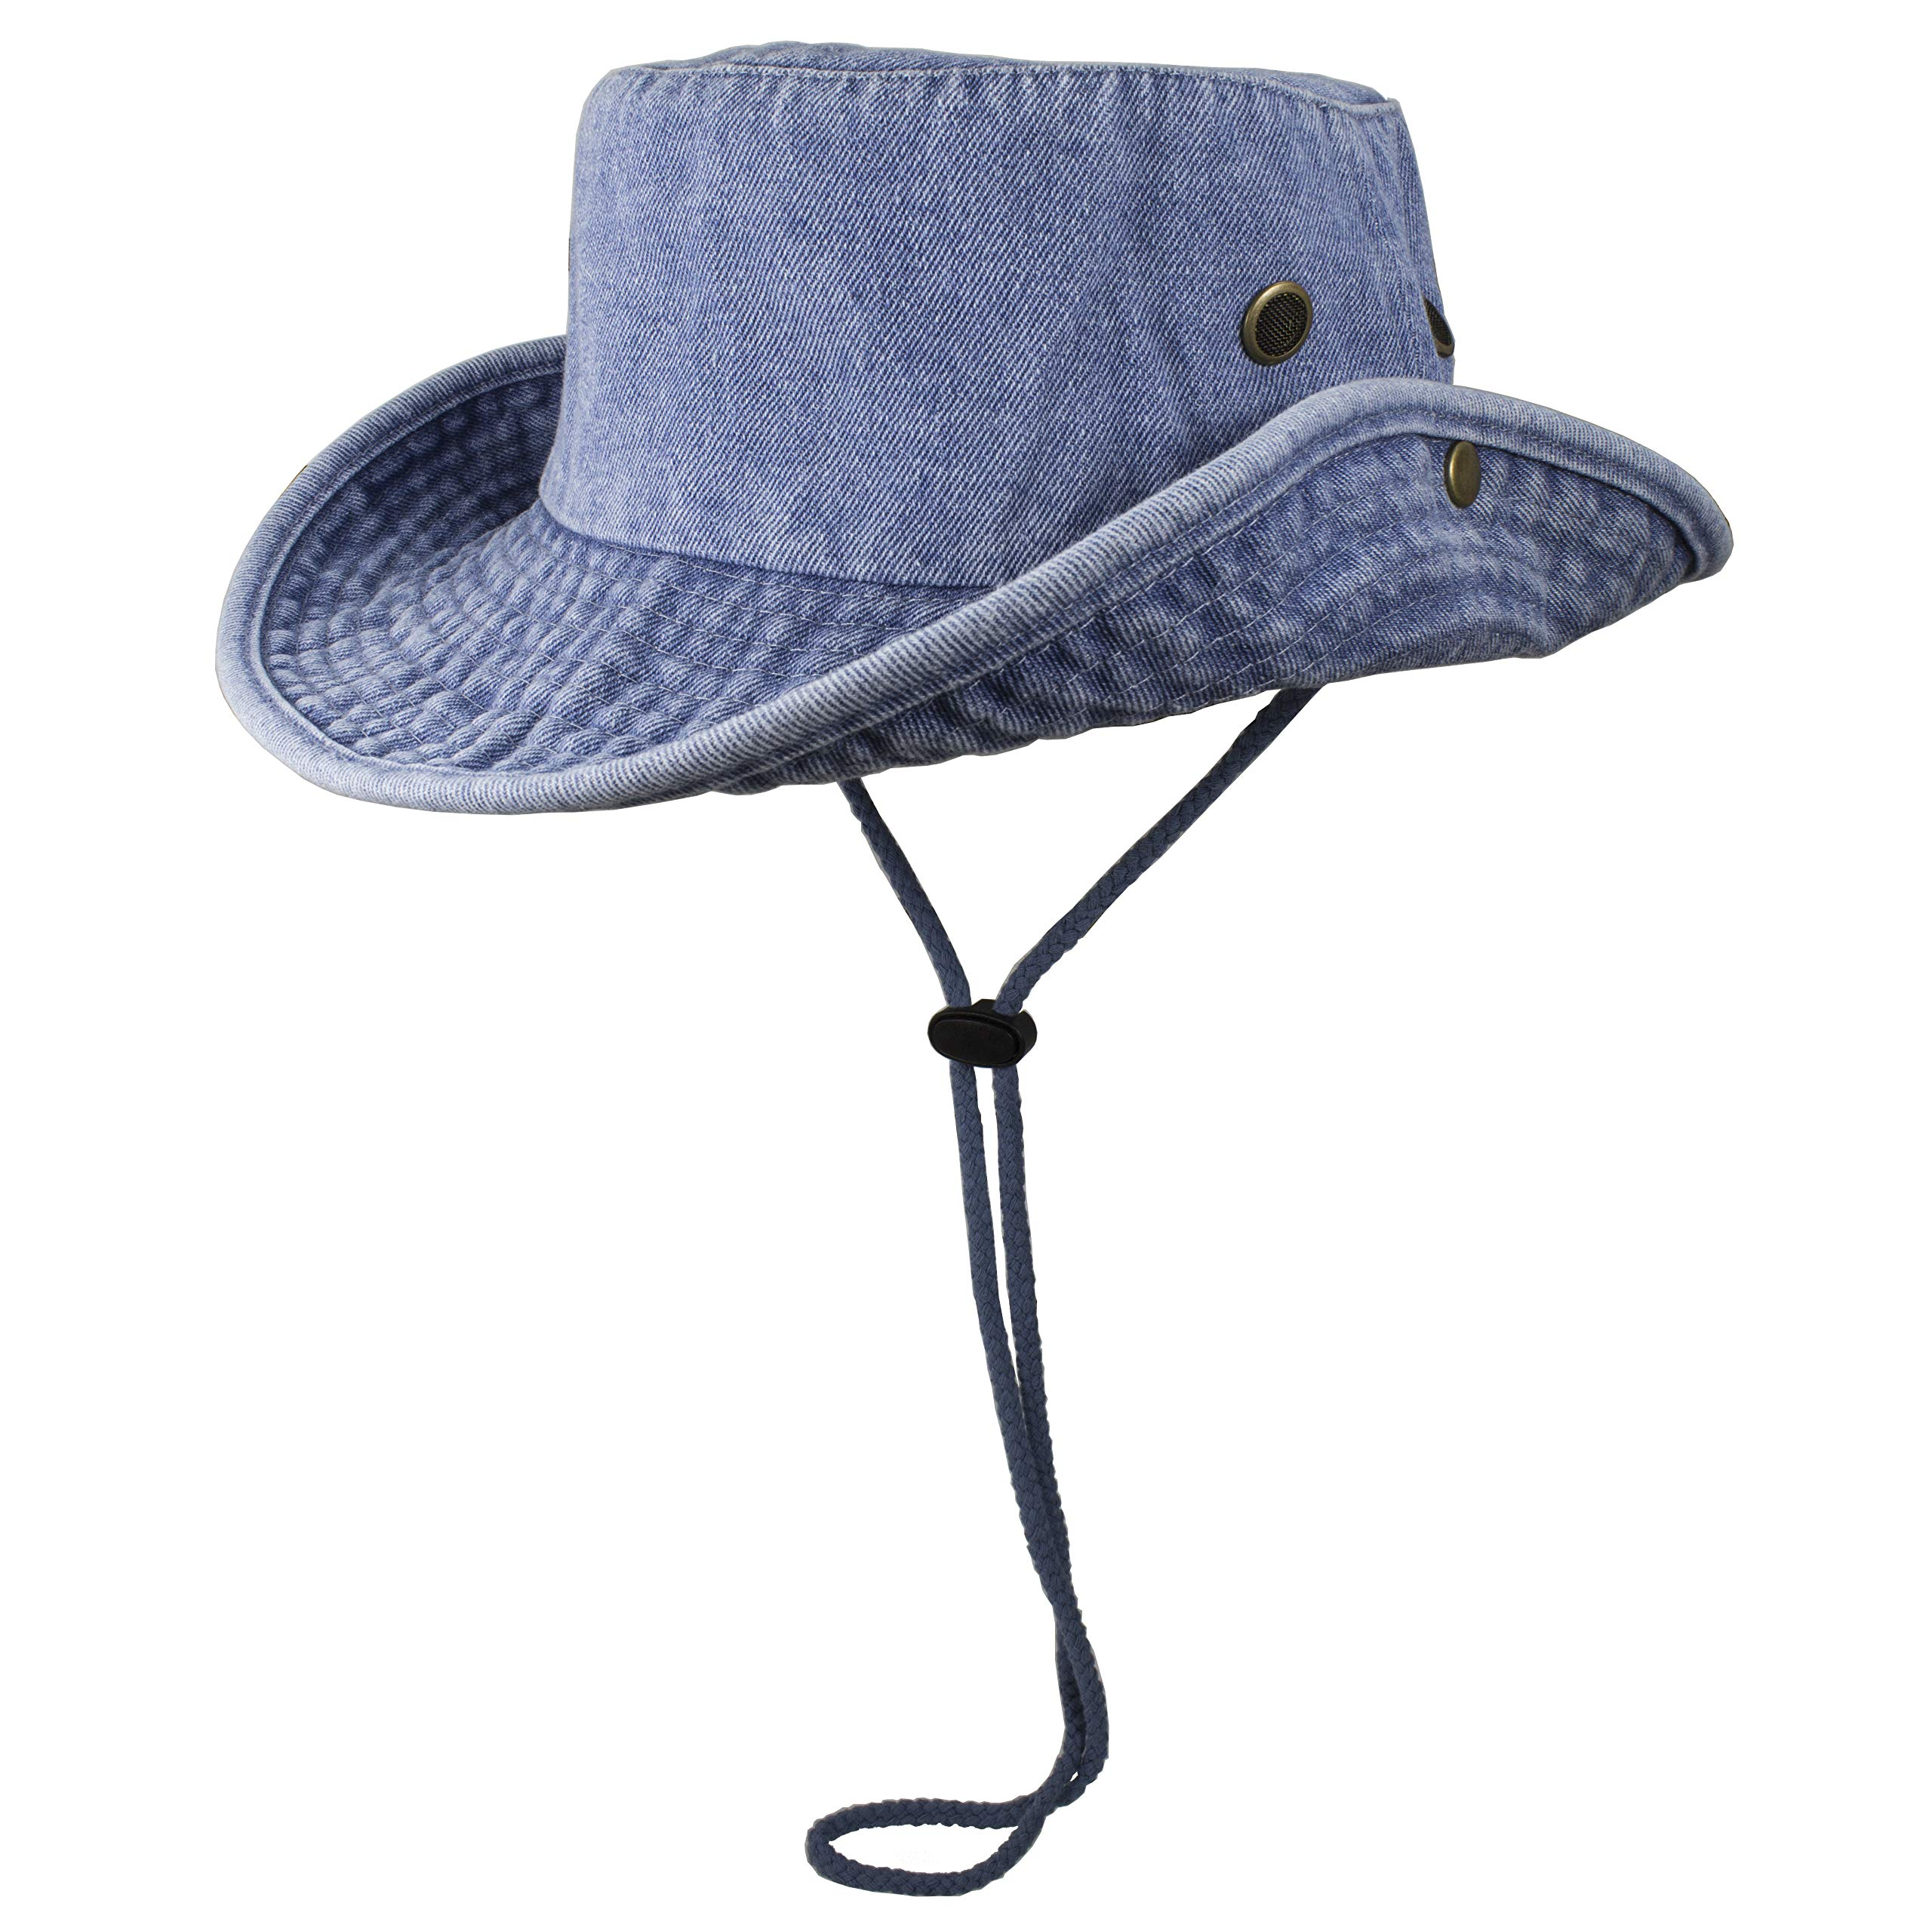 Gelante 100% Cotton Stone-Washed Safari Booney Sun Hats (Small/Medium, Denim Blue)